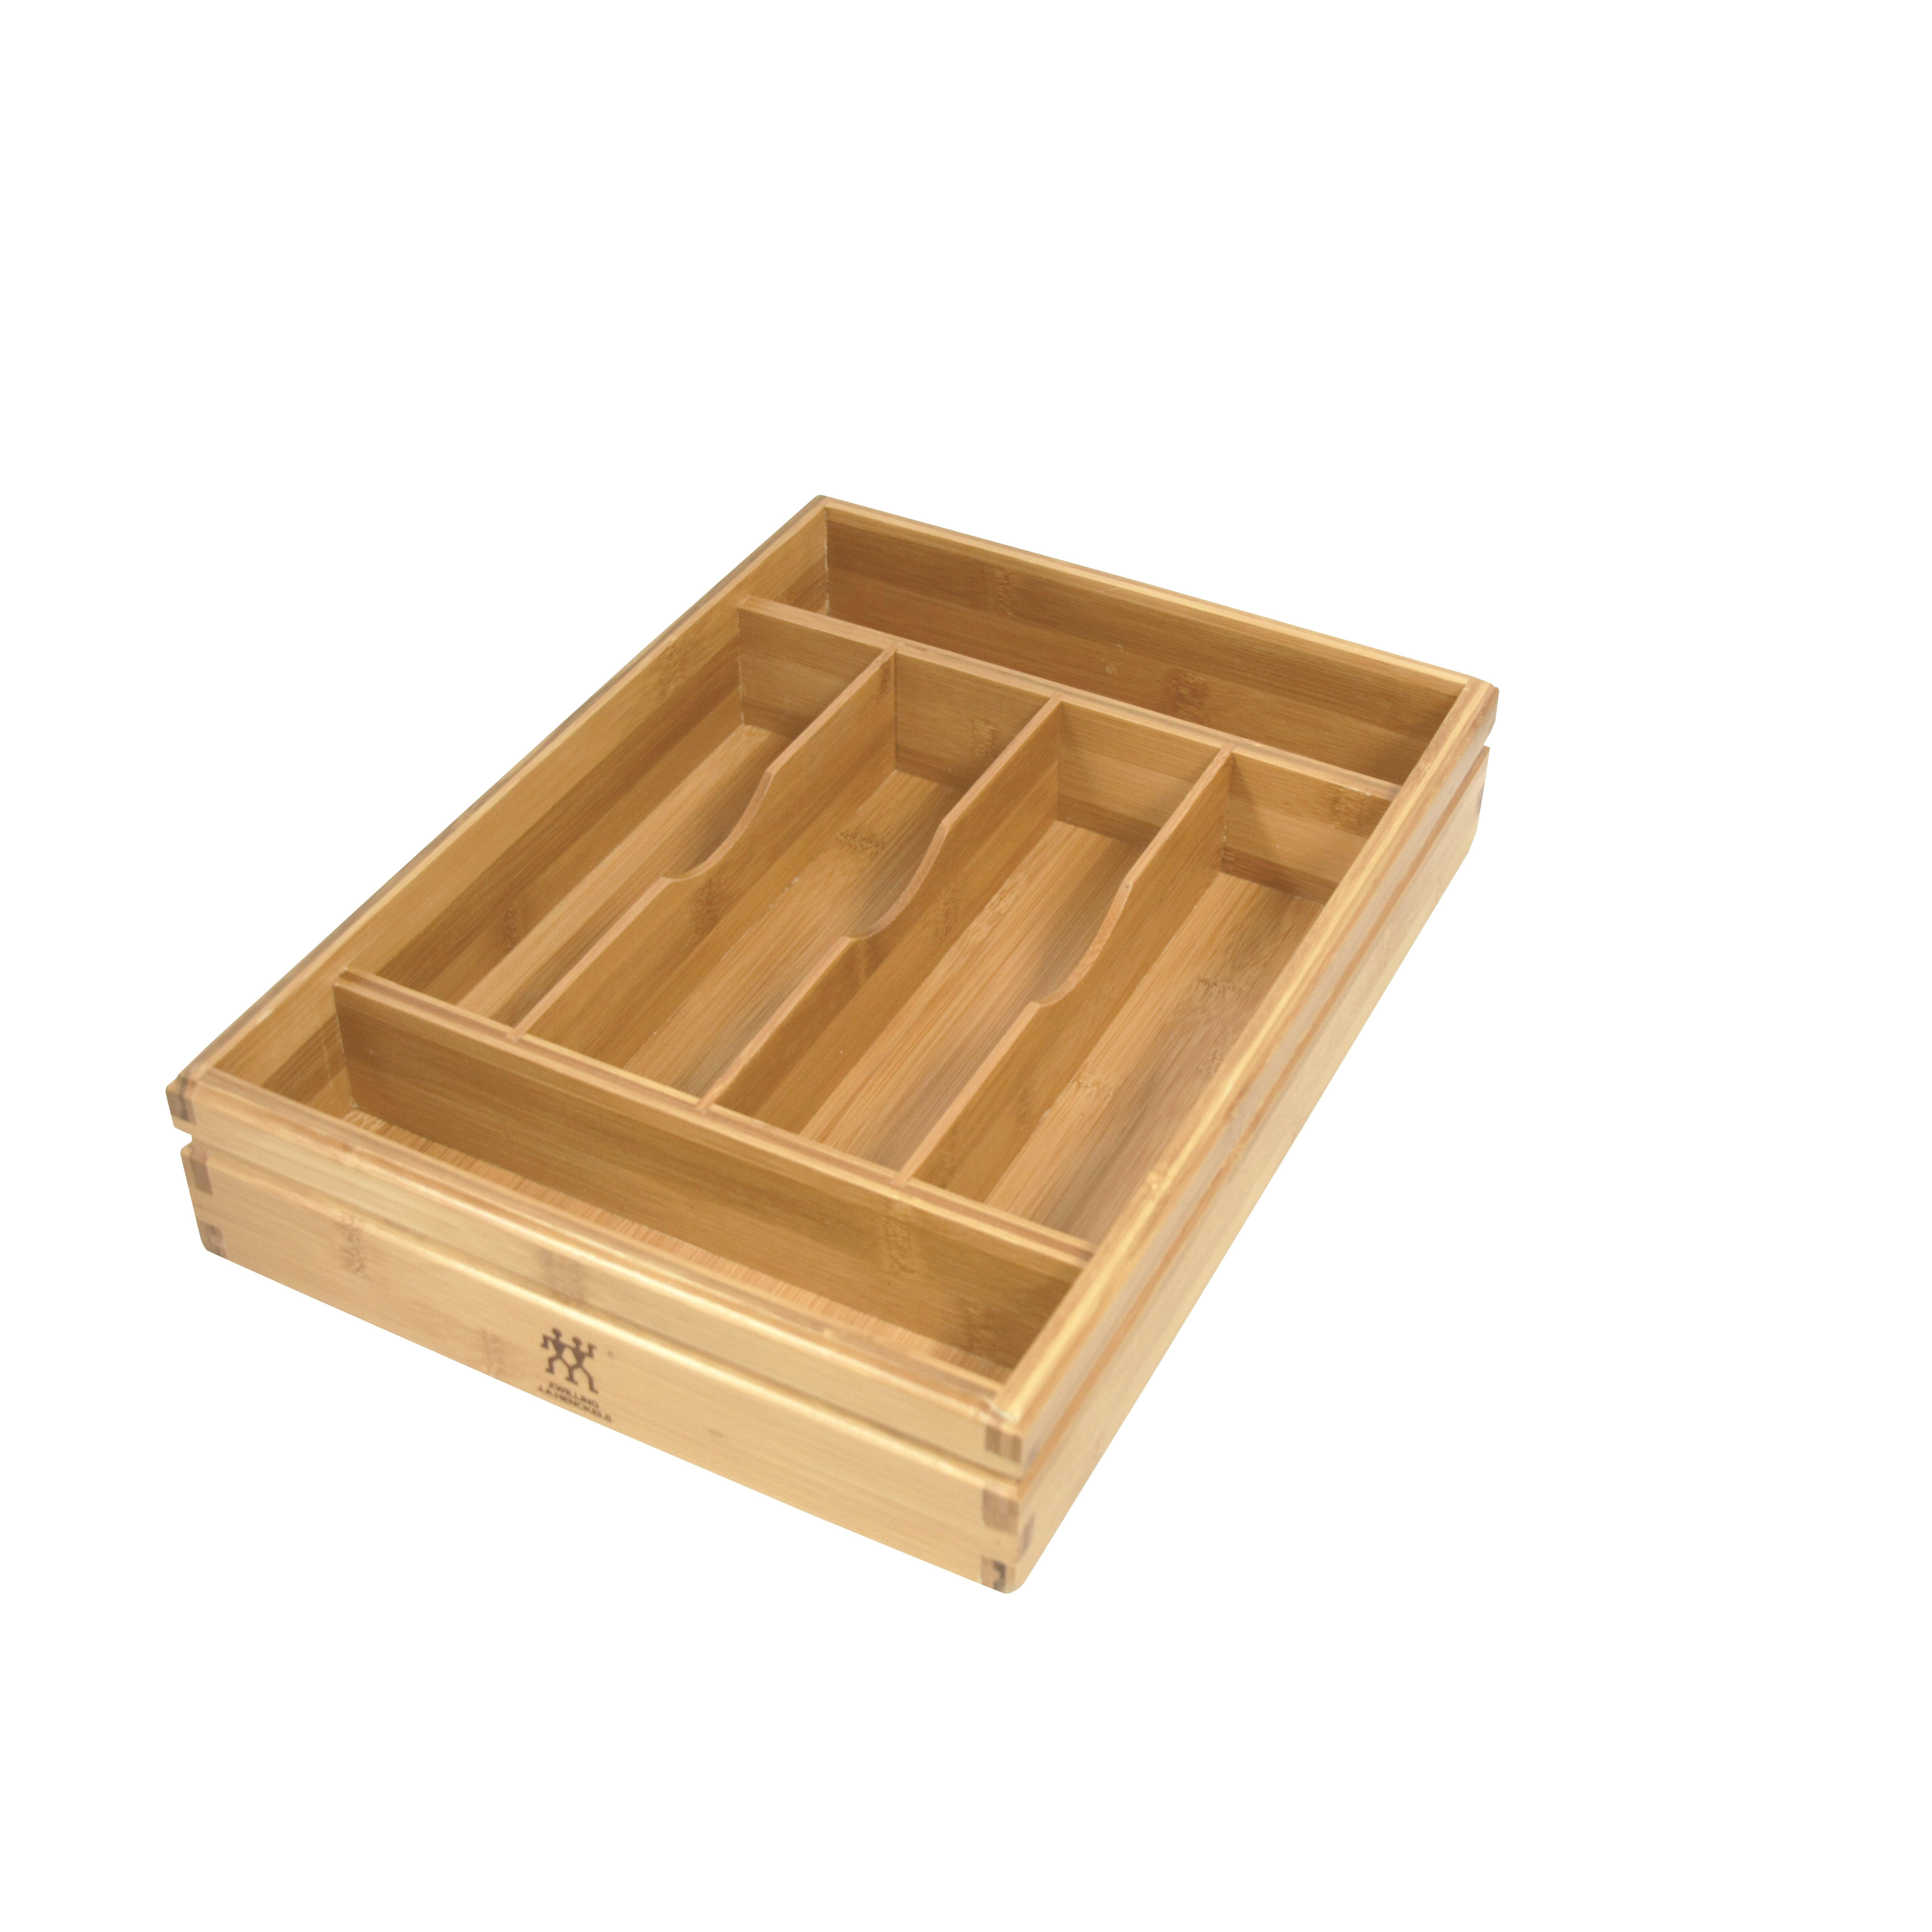 Zwilling Ja Henckels Bamboo Flatware Storage Tray